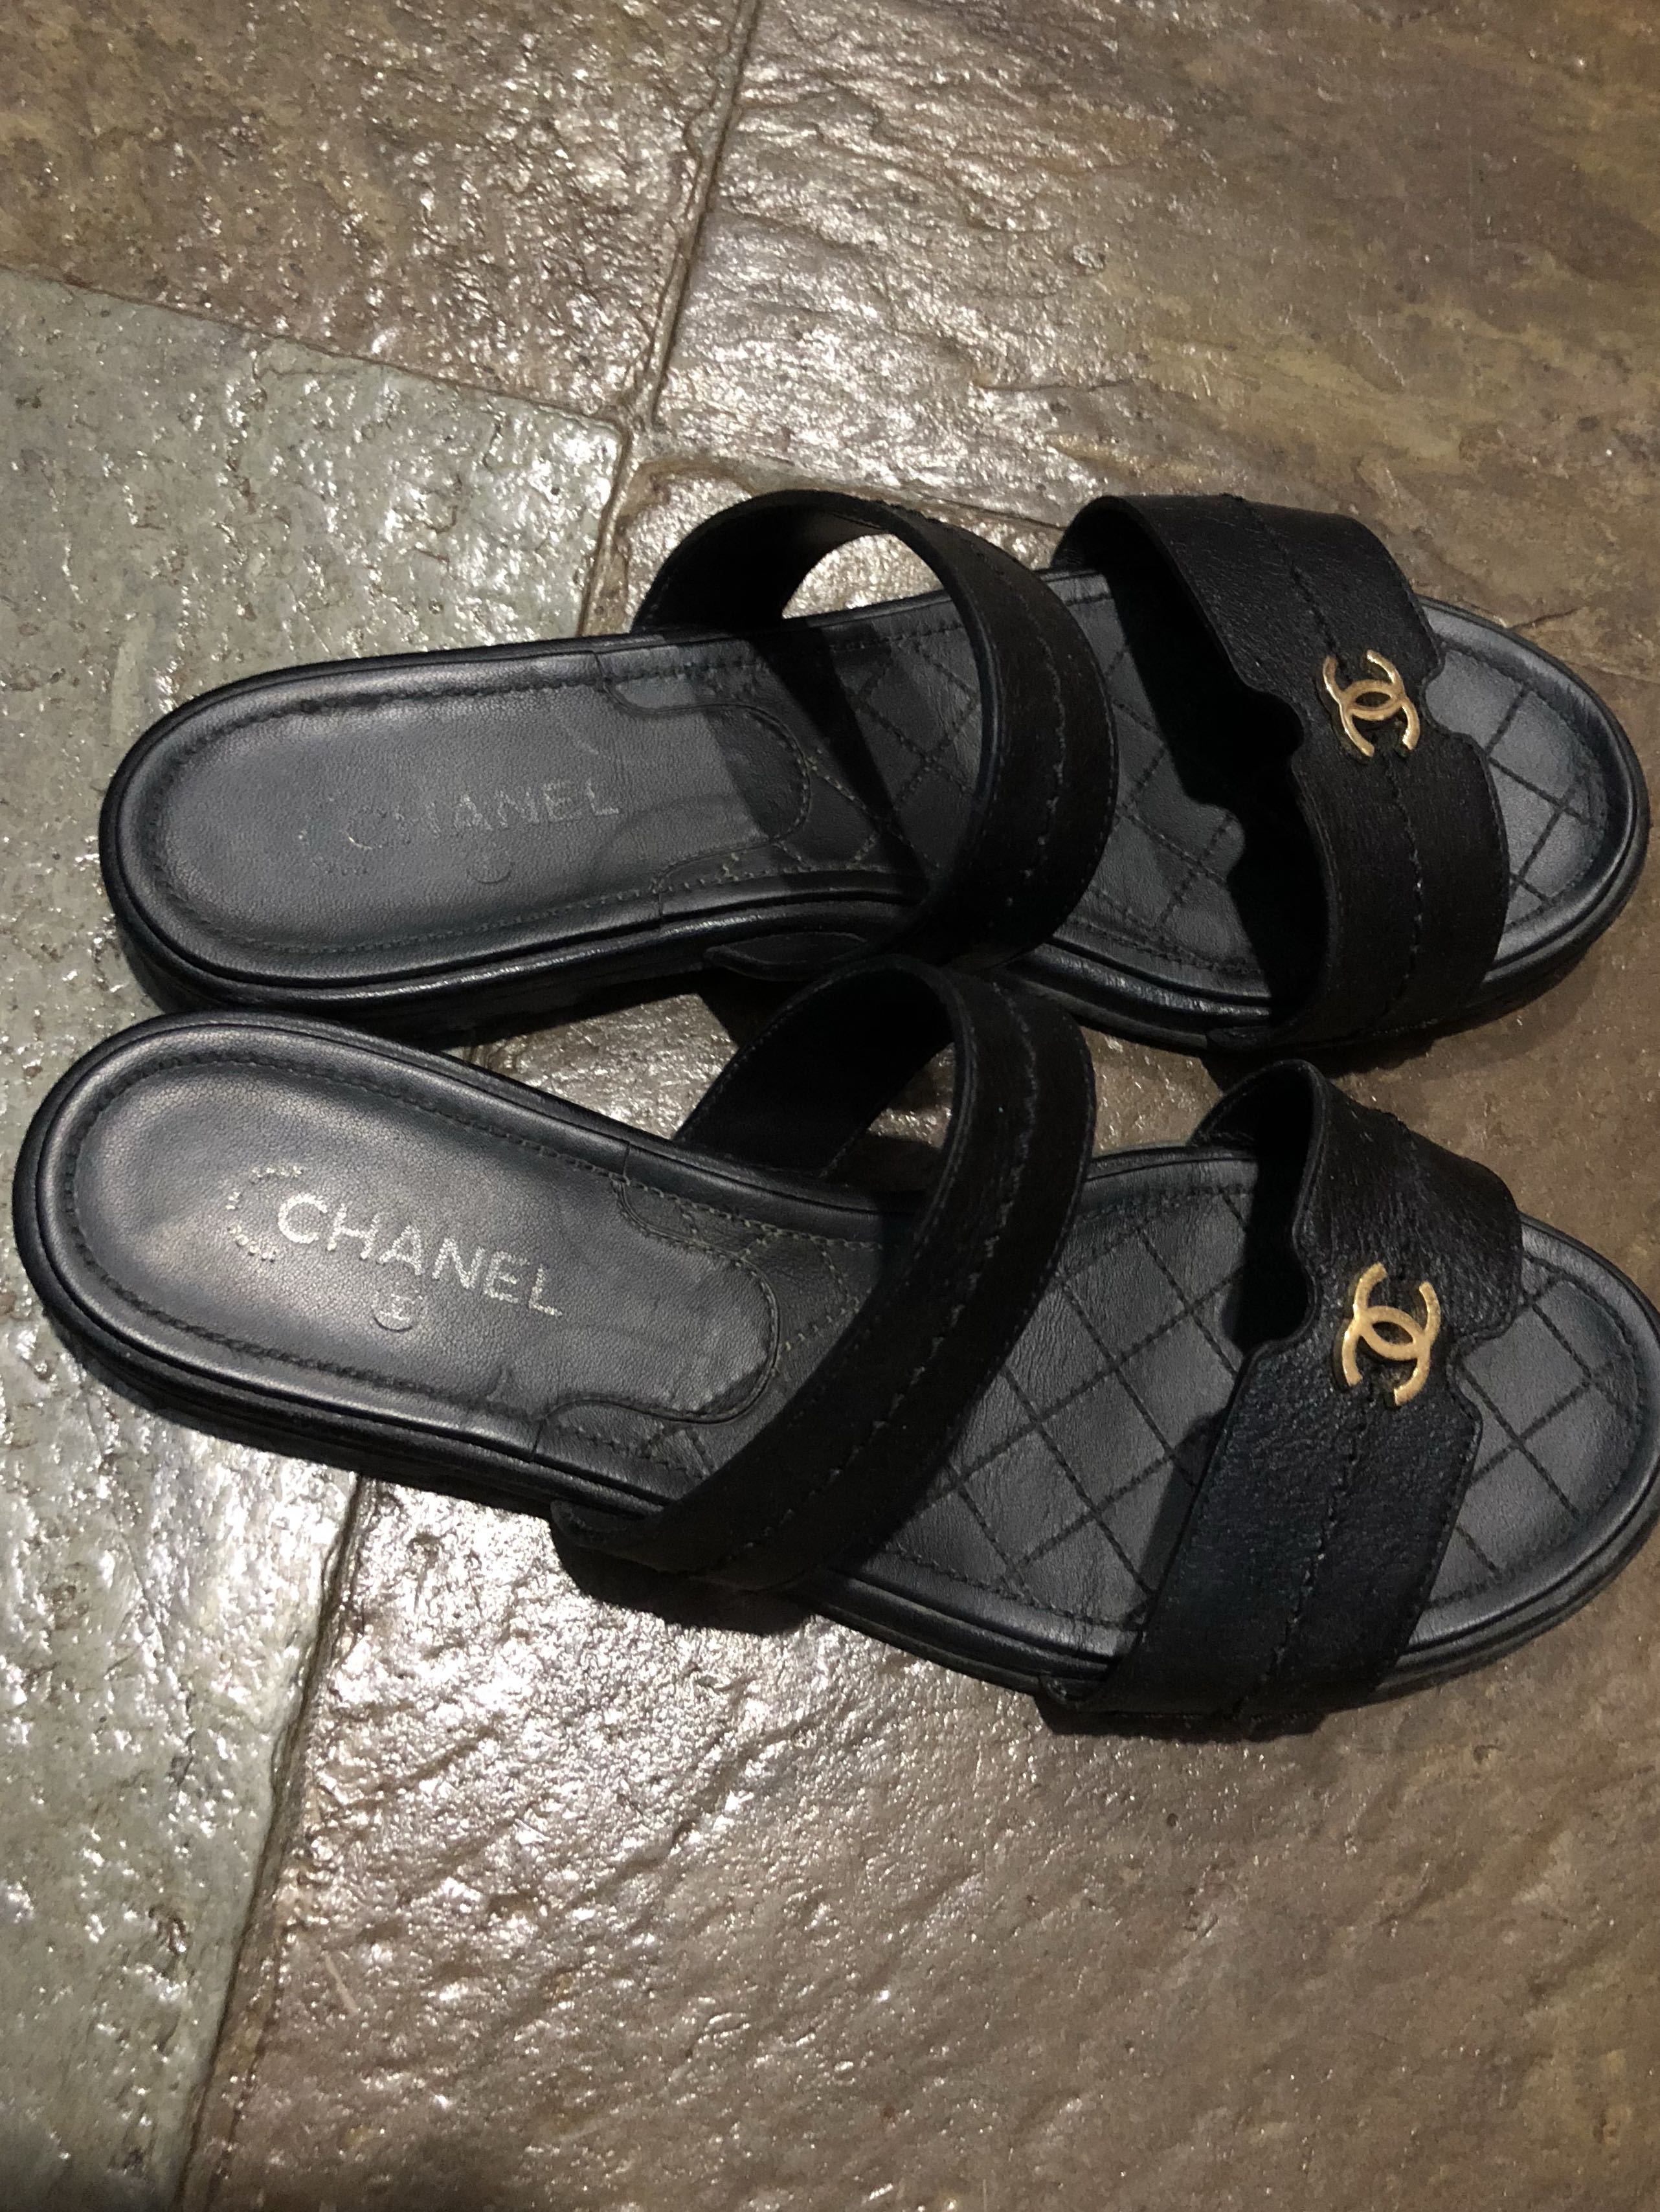 83892faf215 Home · Women s Fashion · Shoes. photo photo photo